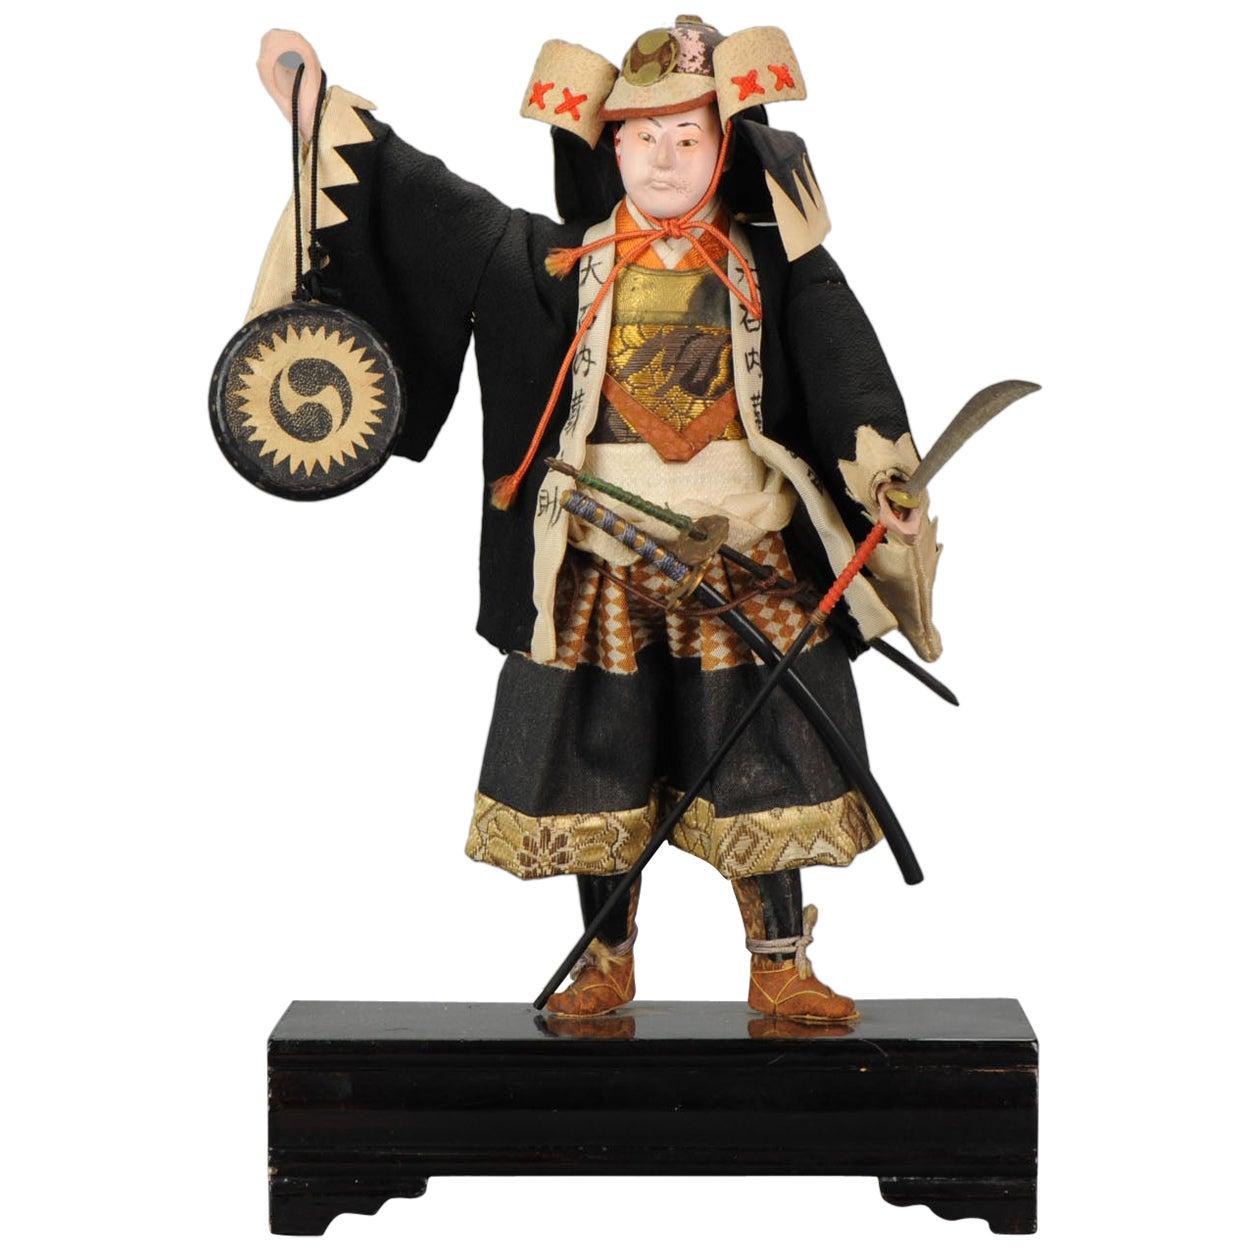 Lovely Japanese Ningyo Doll, Tanaka Doll, Samurai Warrior, 19th-20th Century